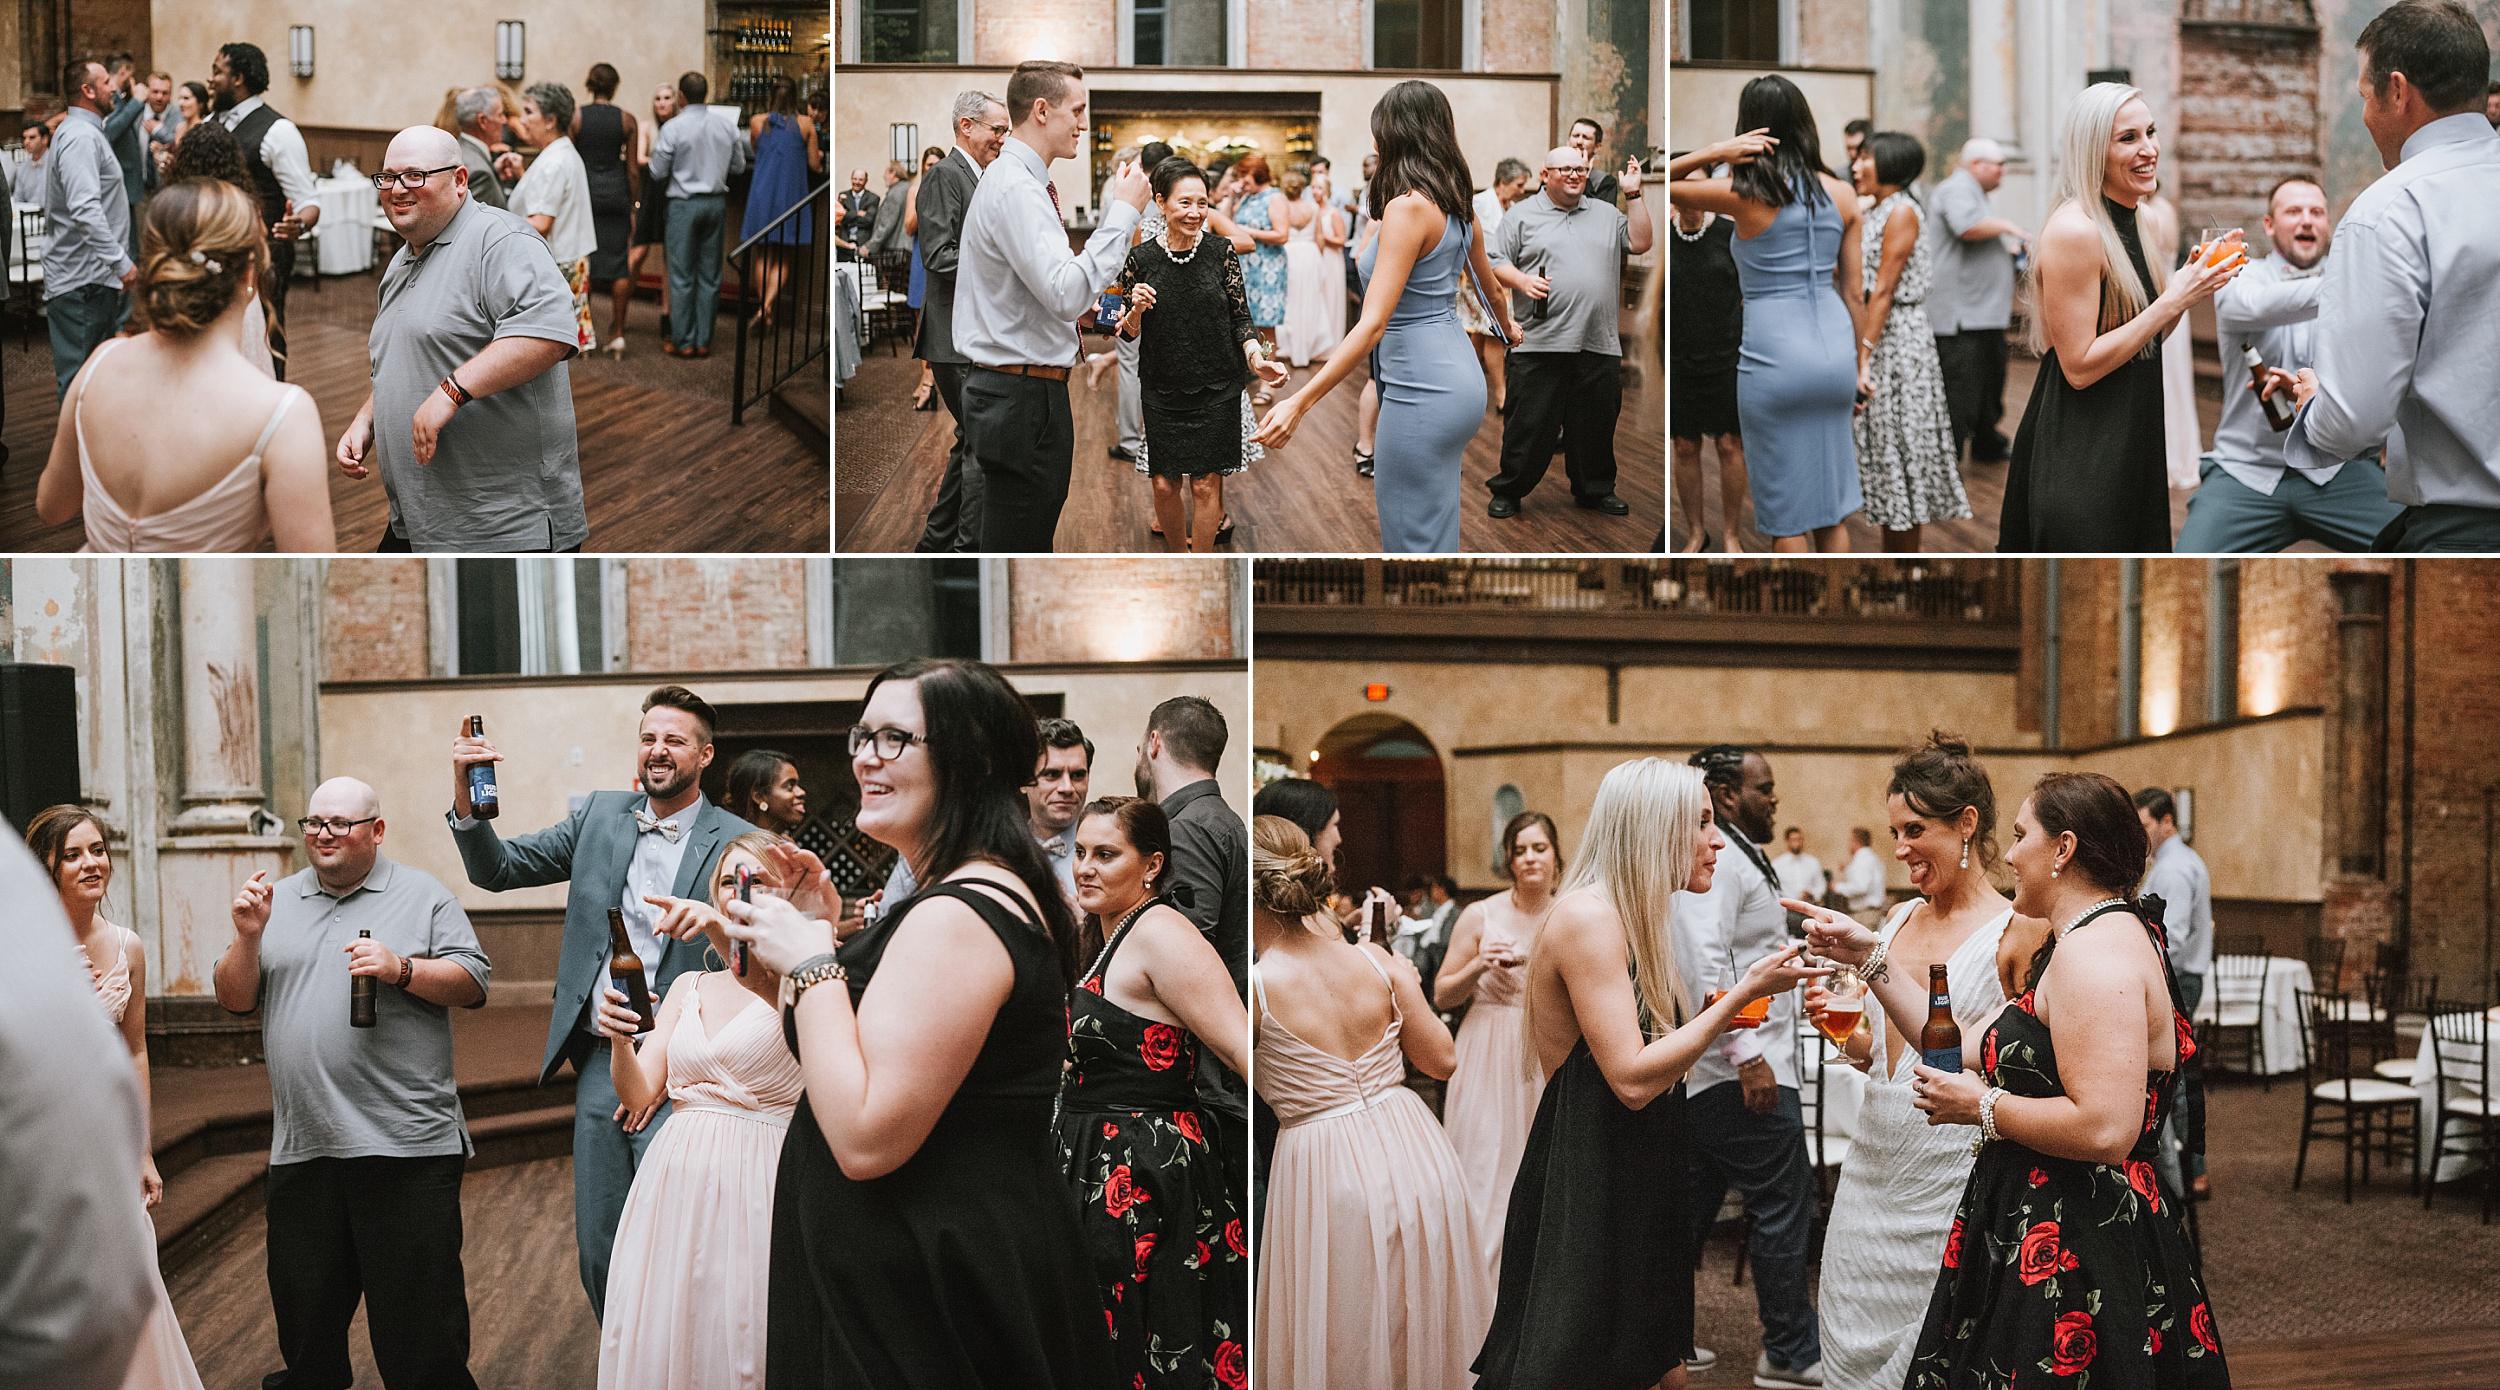 Brooke Townsend Photography - Cincinnati Wedding Photographer (163 of 170).jpg